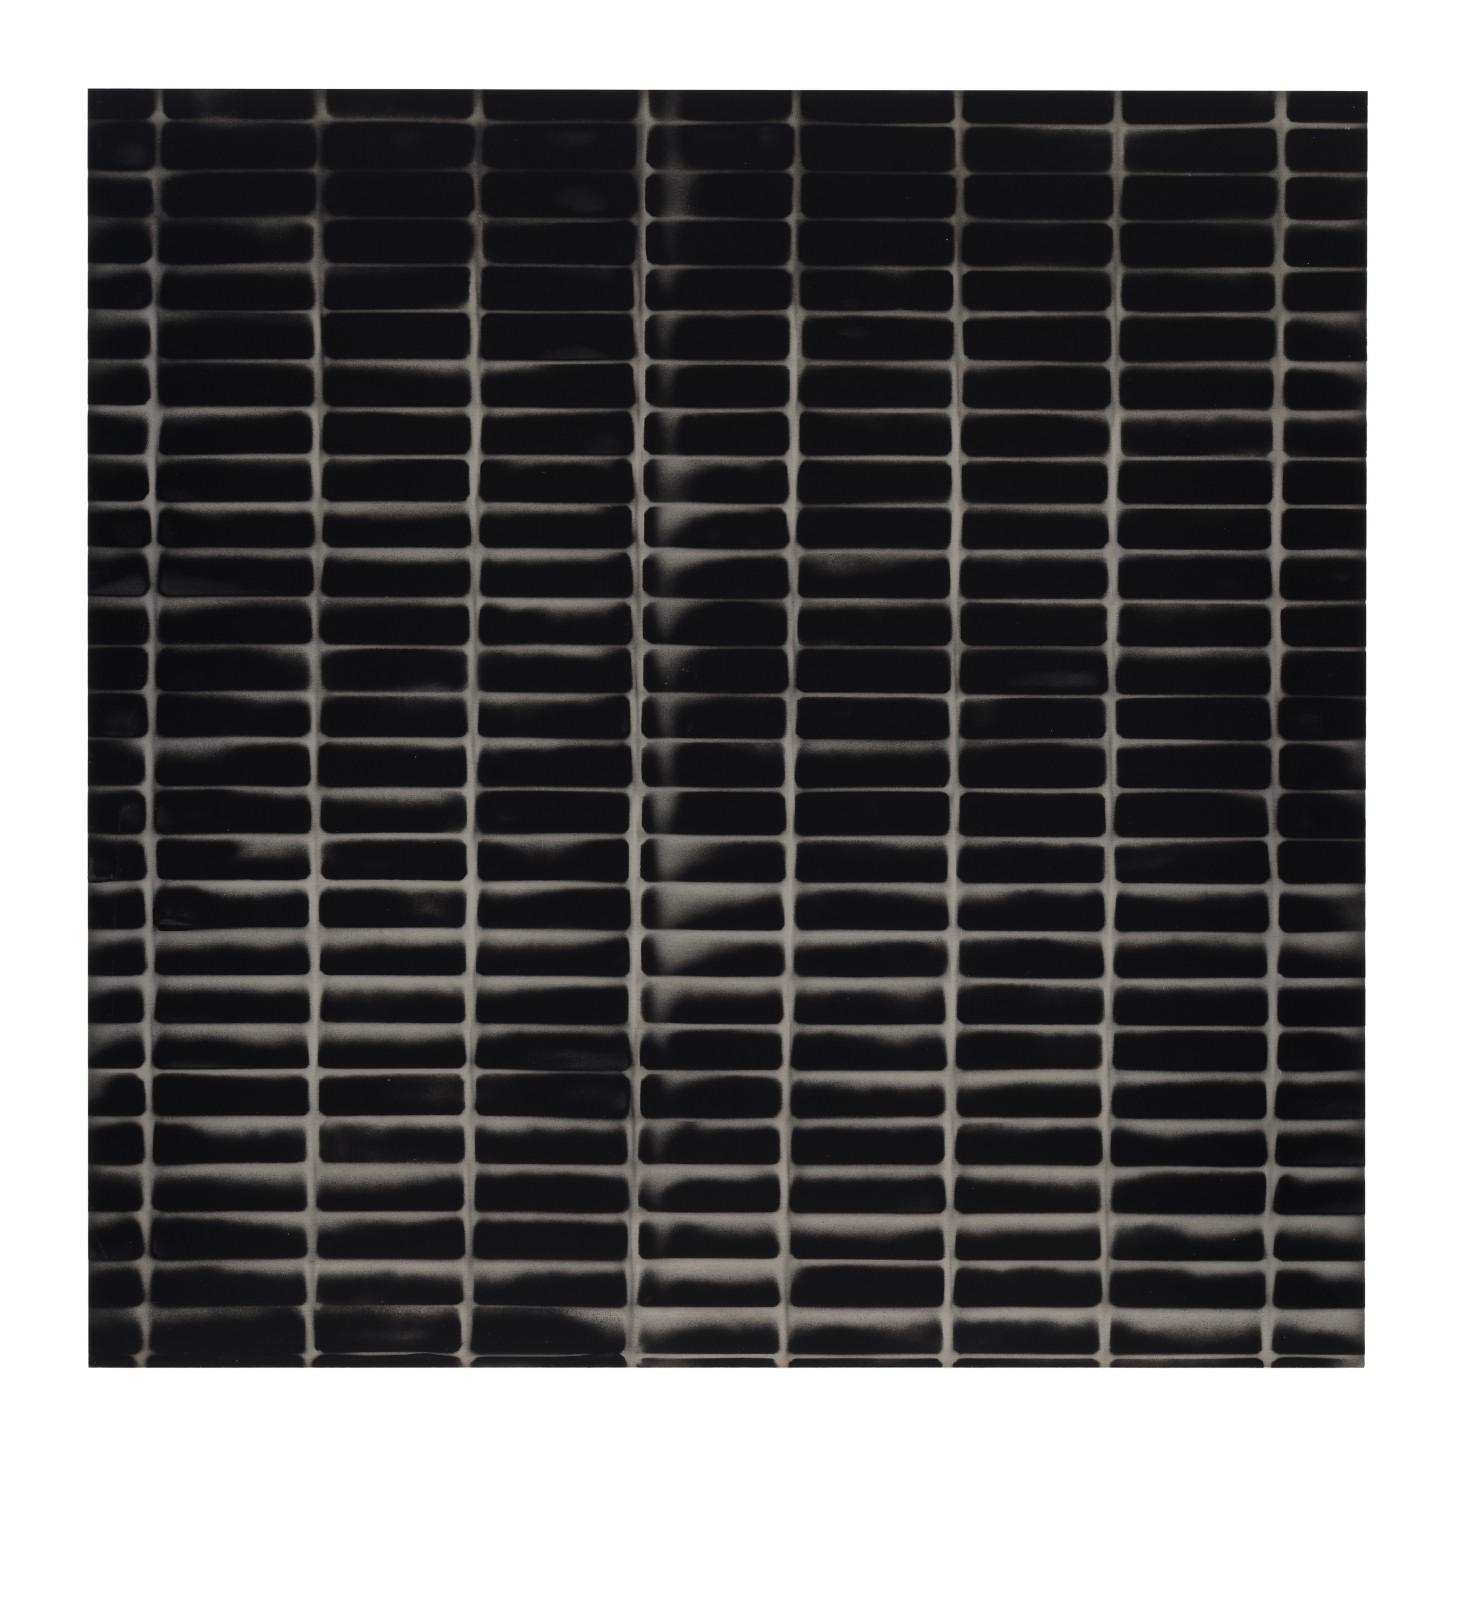 "STAIN : 40°42'52.5""N 73°56'00.5""W, 2015, spraypaint on aluminium, 81,3 x 81,3 cm"